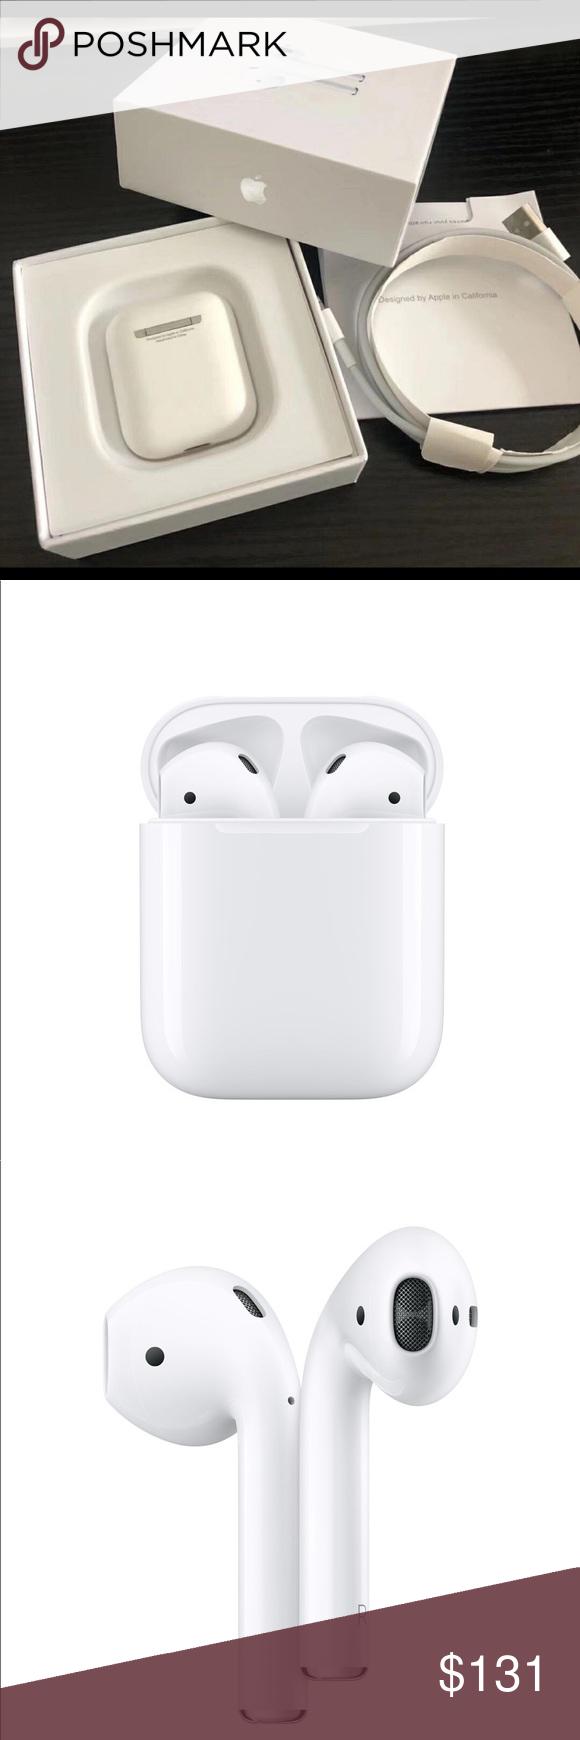 Apple Air Pods Air pods, Apple air, Apple